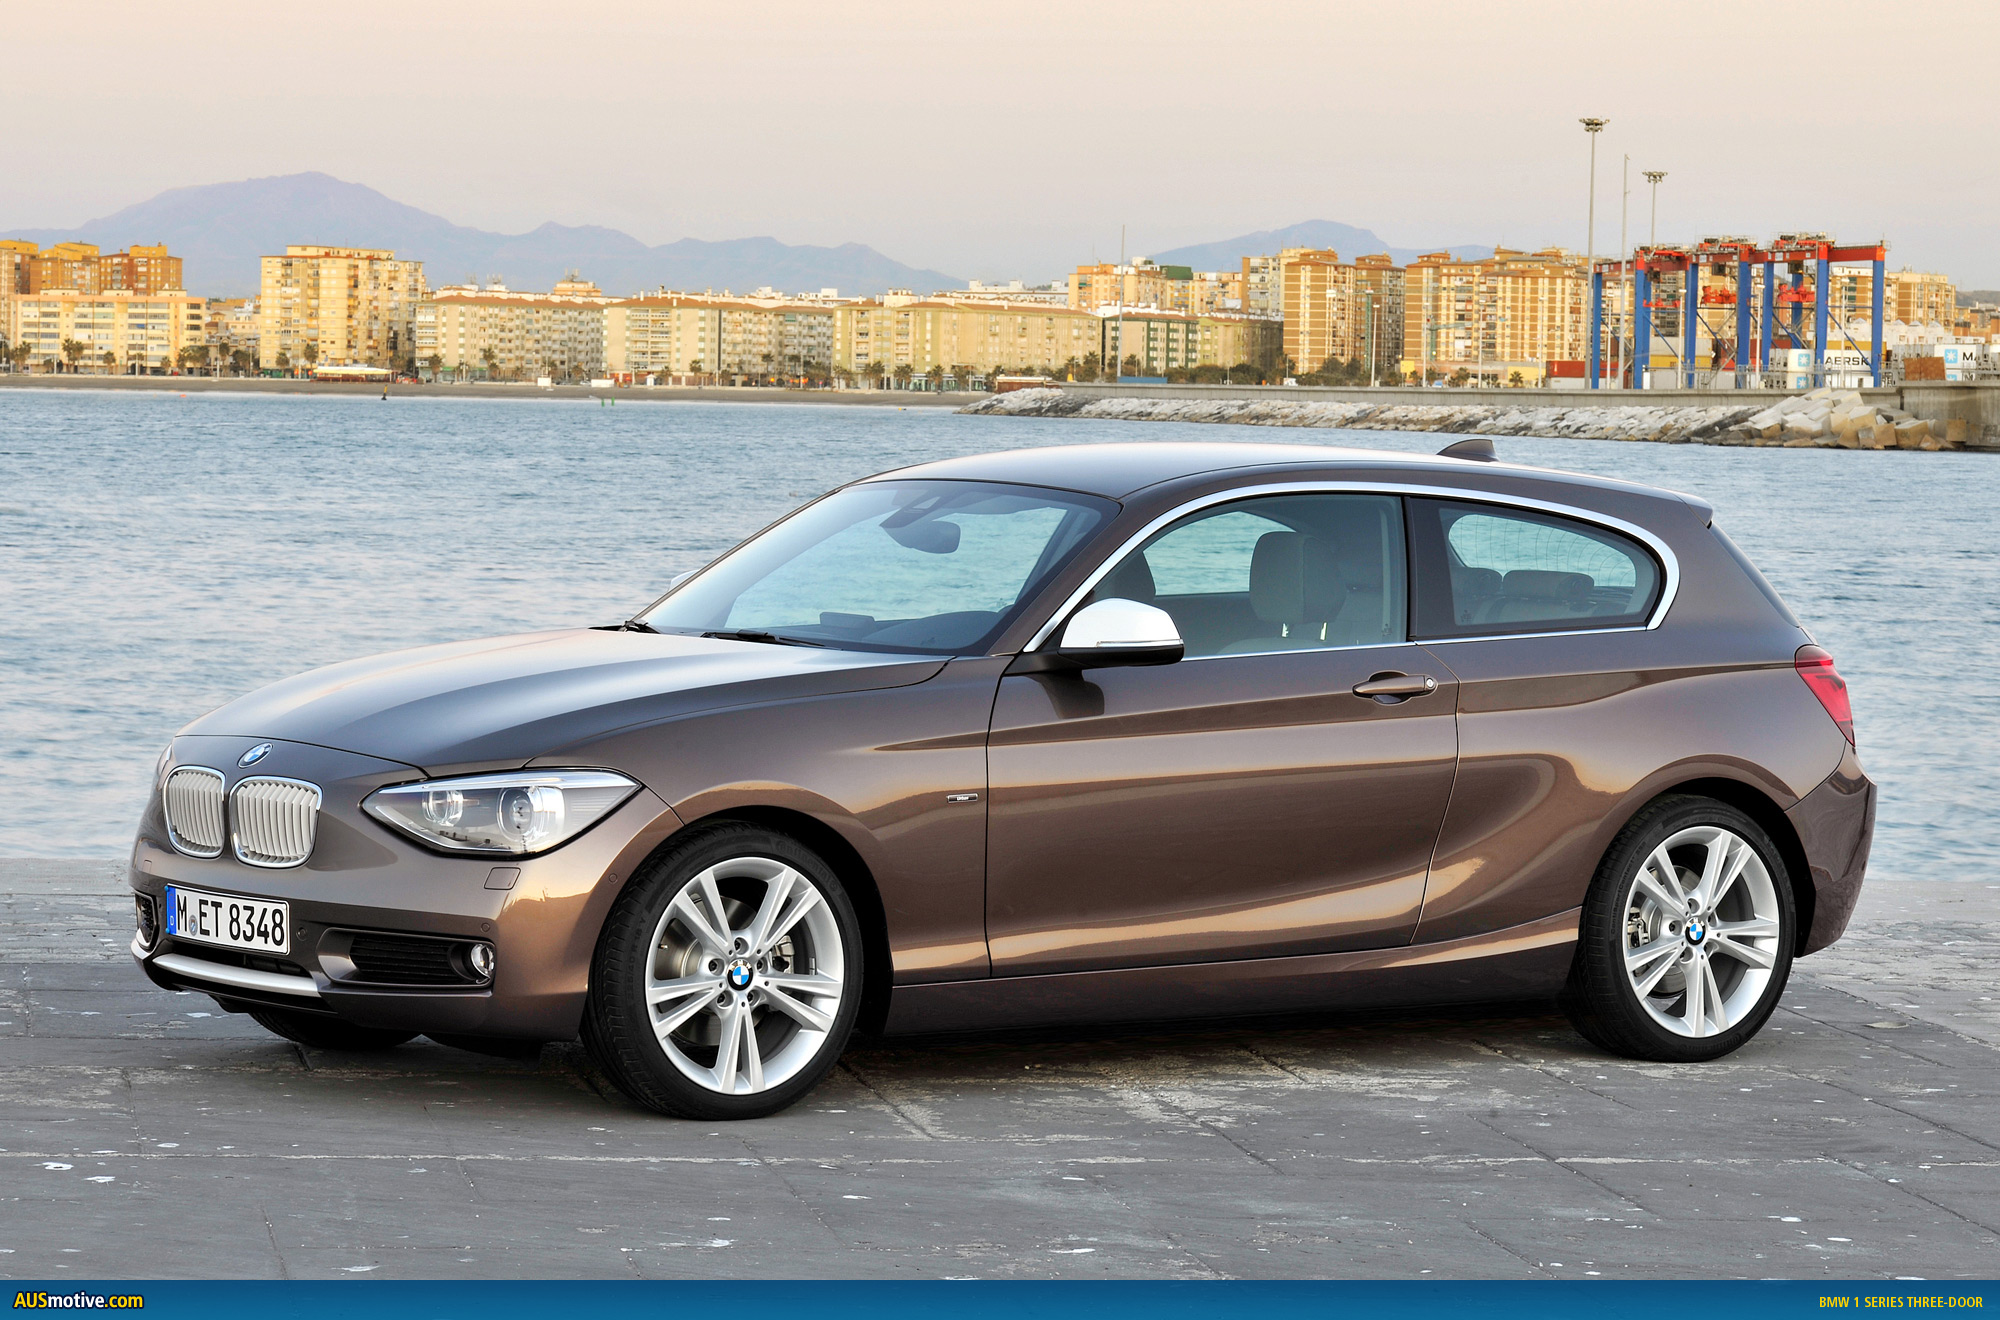 Ausmotivecom » Bmw 1 Series 3 Door Revealed